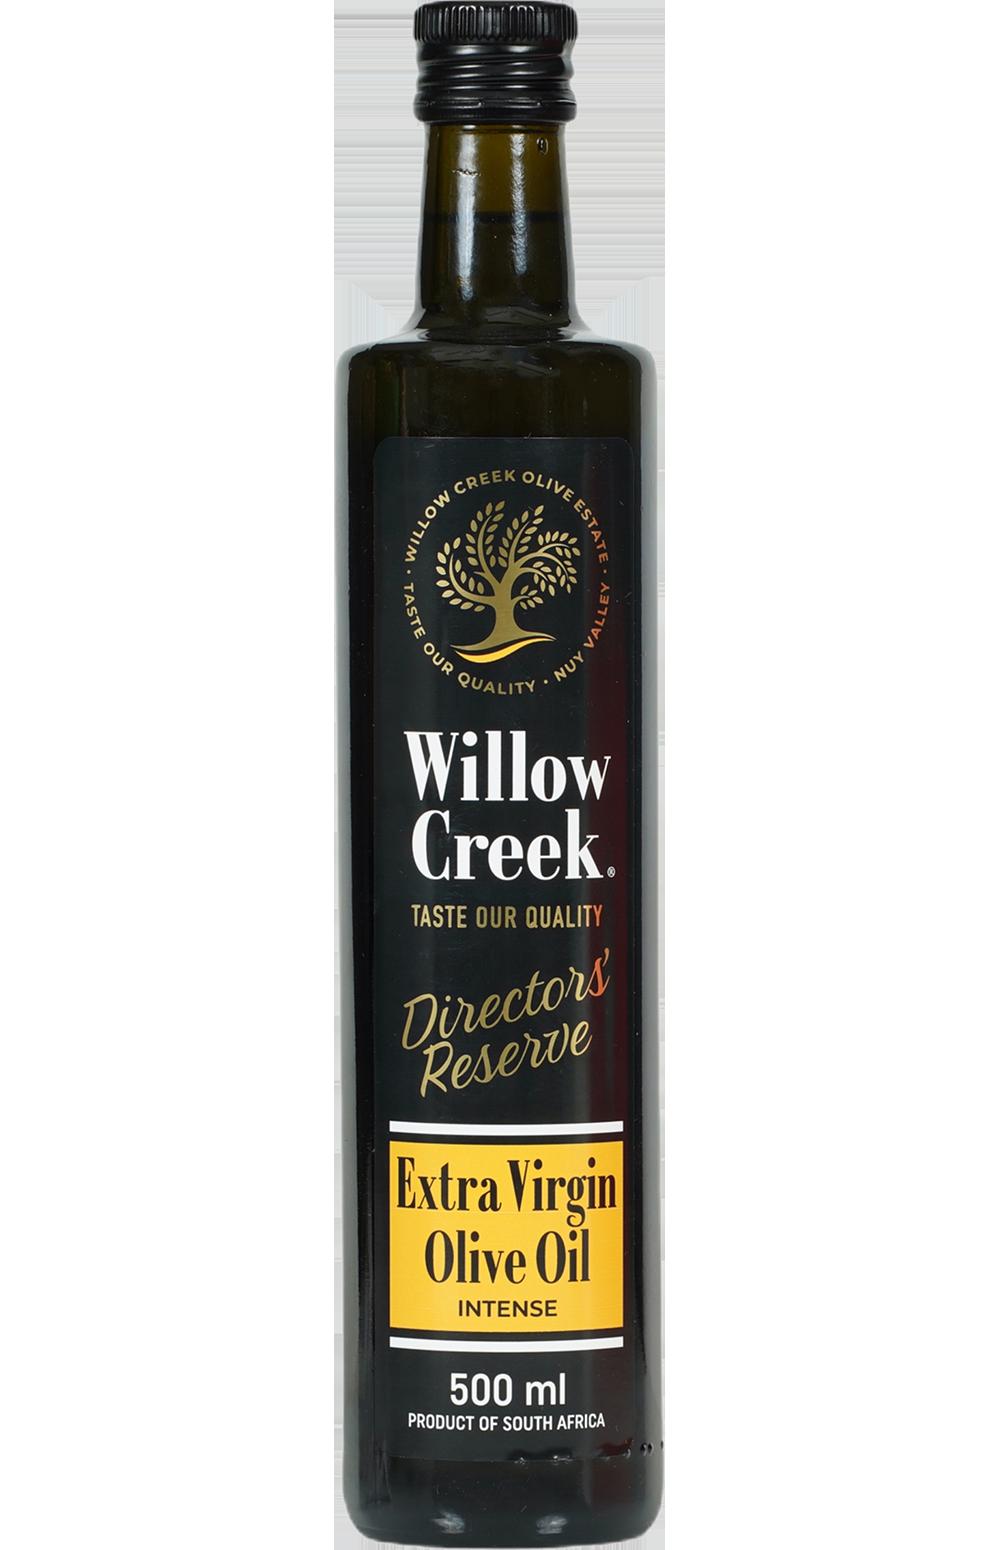 Willow Creek Director's Reserve